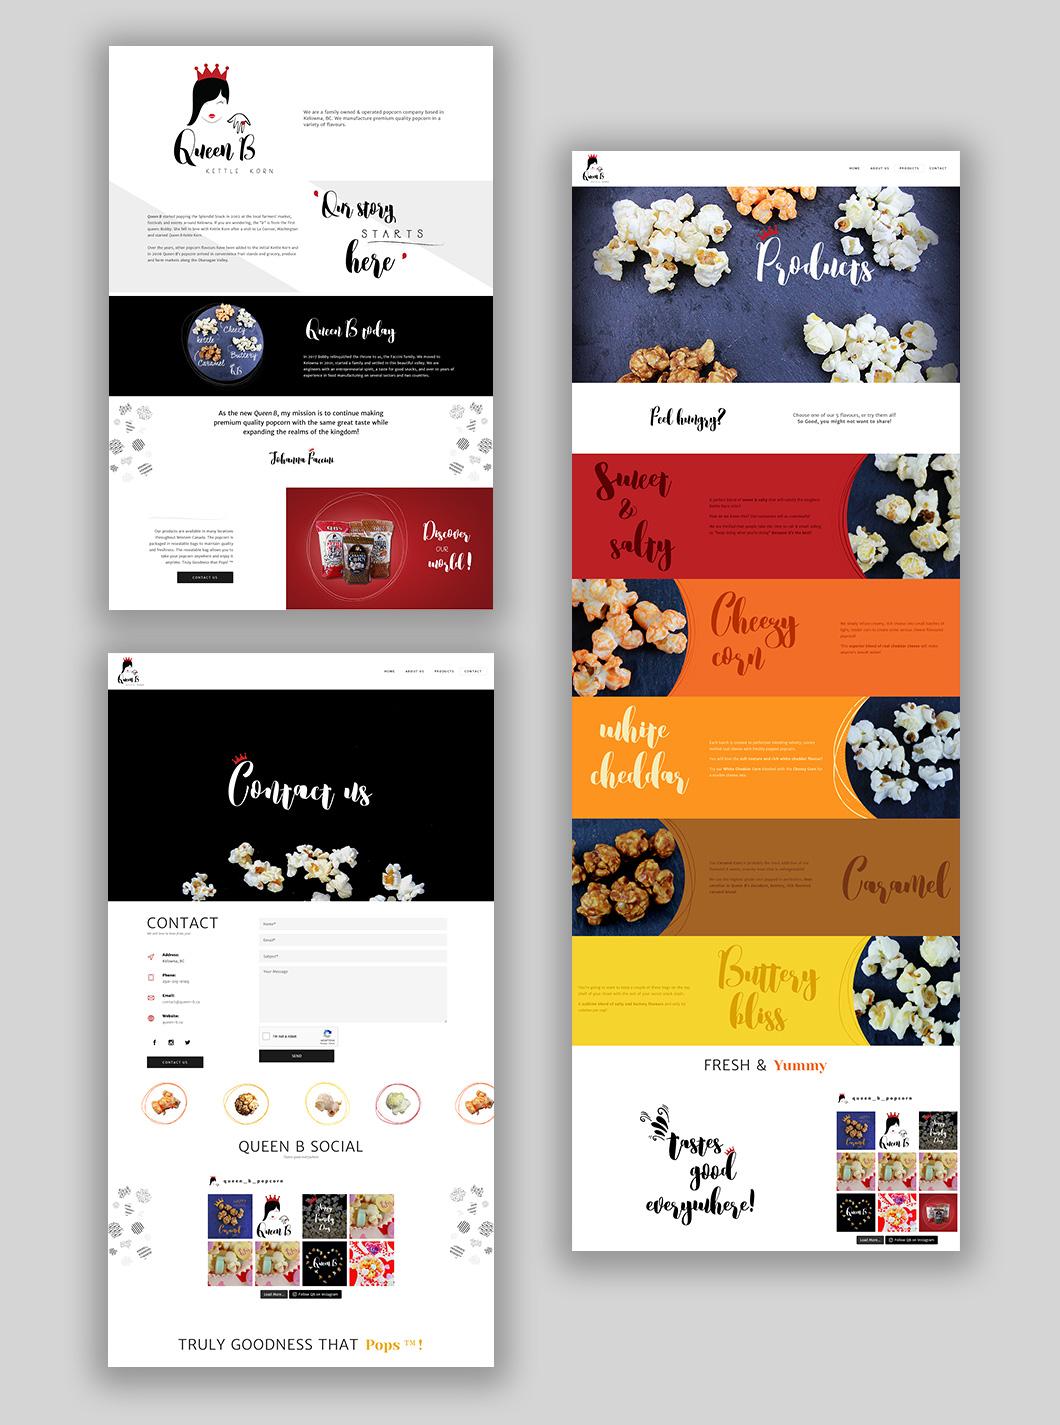 Queen B website design, graphic design, web development, wordpress